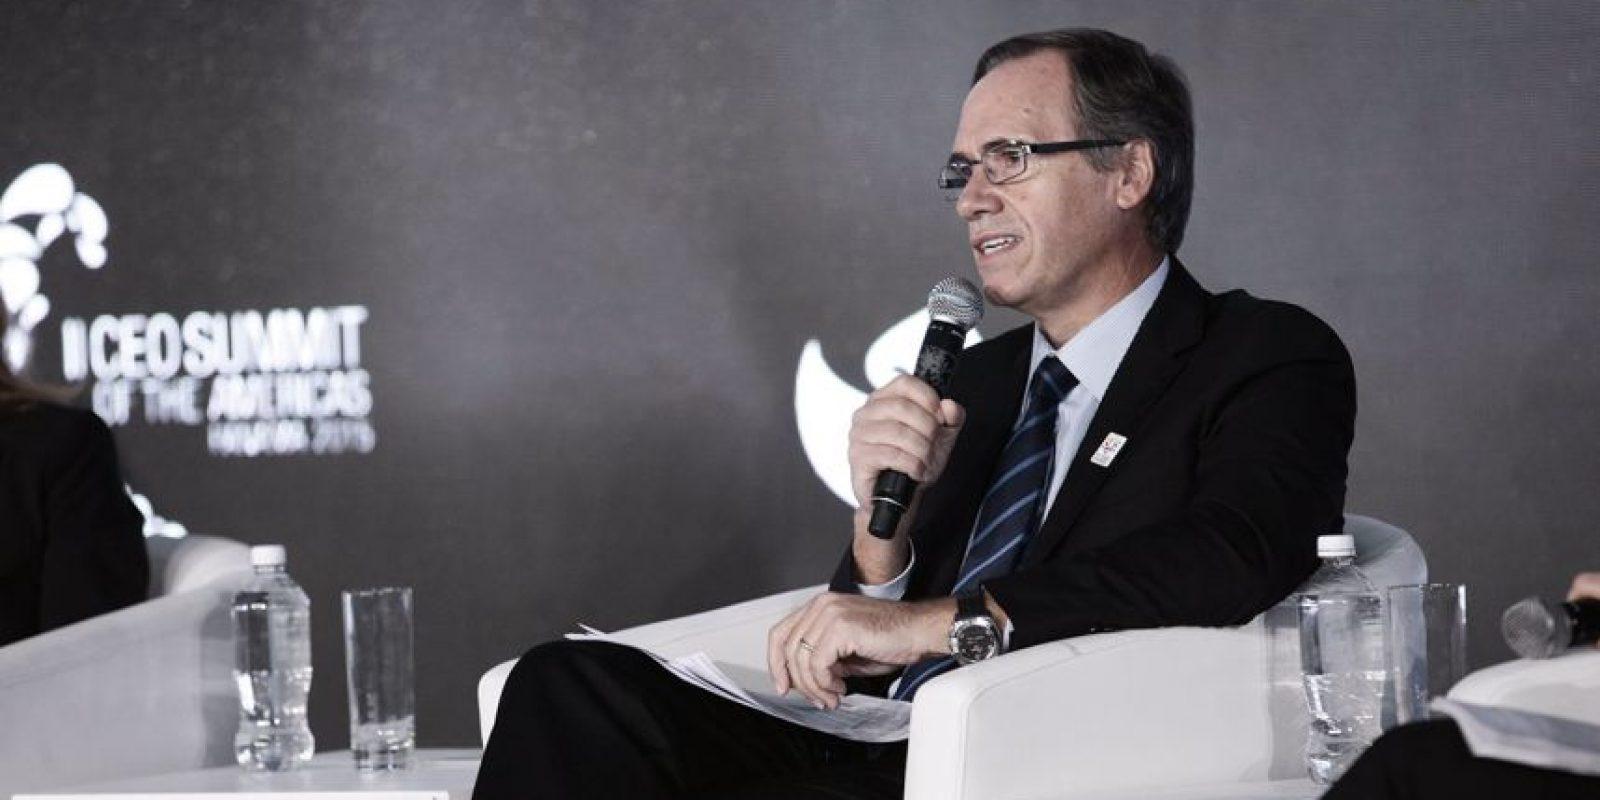 4. Enrique Ostalé – CEO de Walmart para América Latina Foto:Cumbreempresarialdelasamericas.com